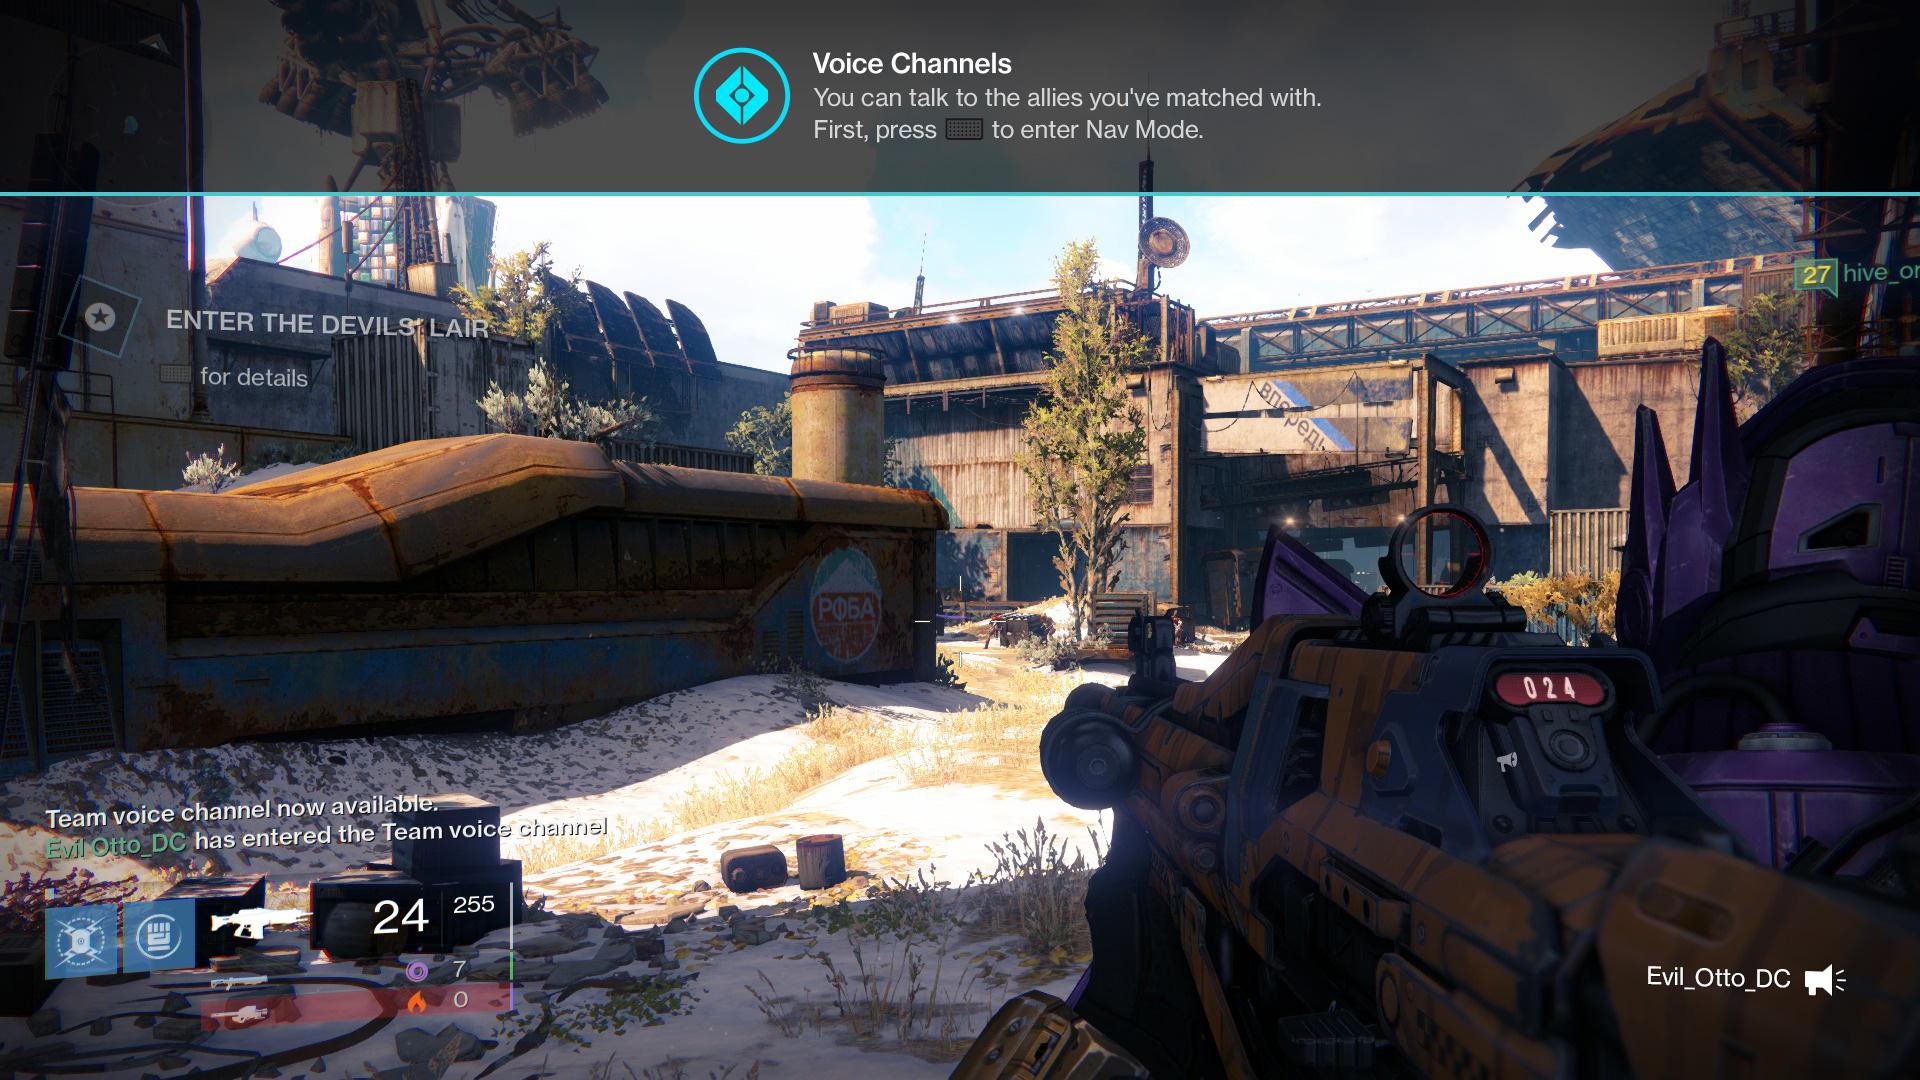 「Destiny」に切り替え可能な選択式のボイスチャットが導入、実装は11月18日予定